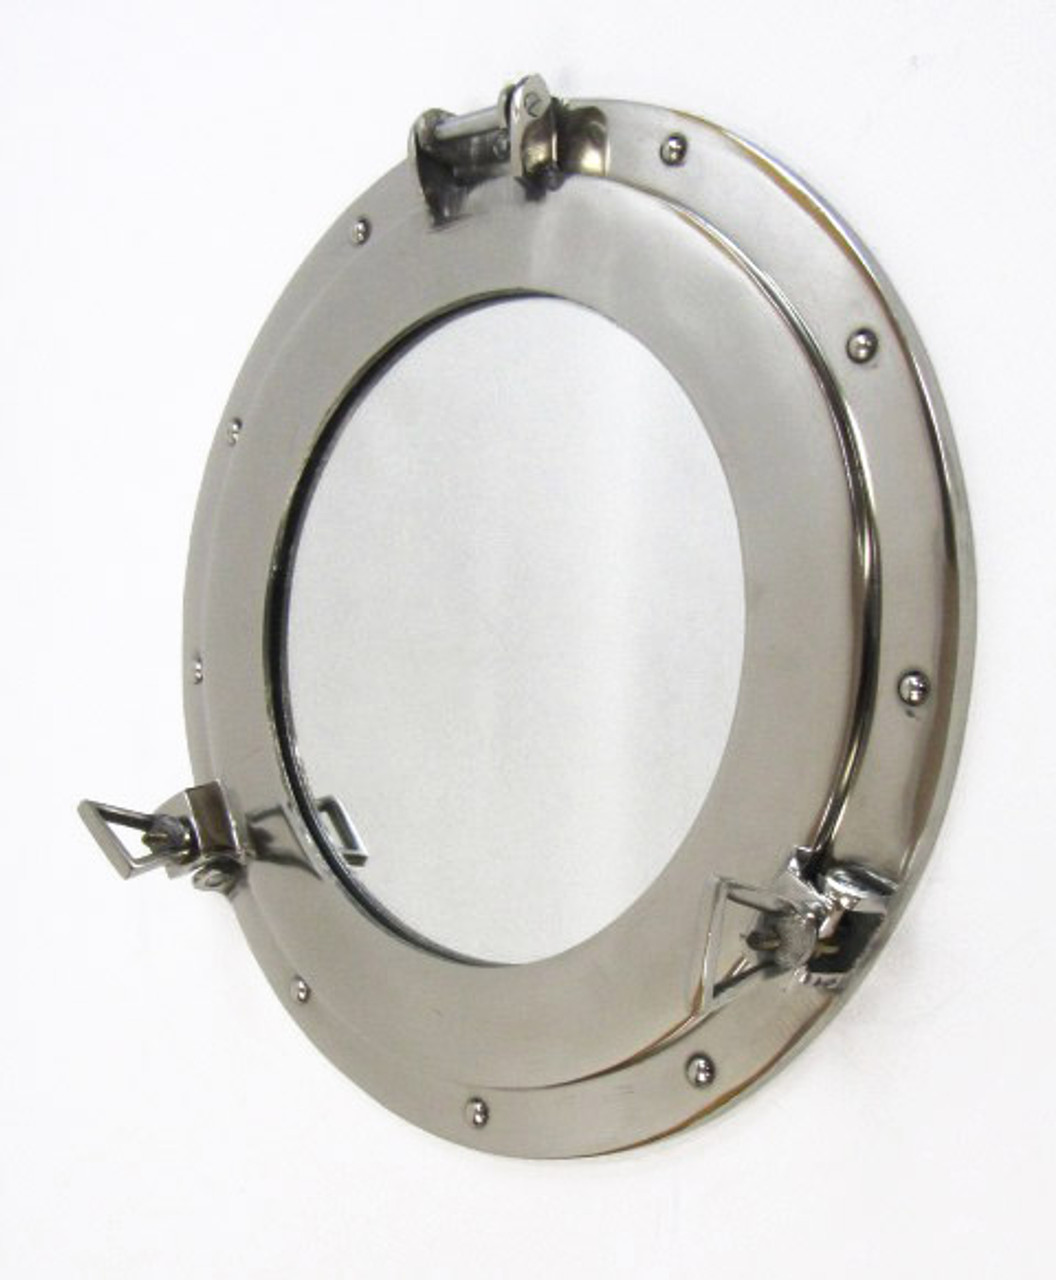 Aluminum Chrome Finish Ship's Cabin Porthole Mirror